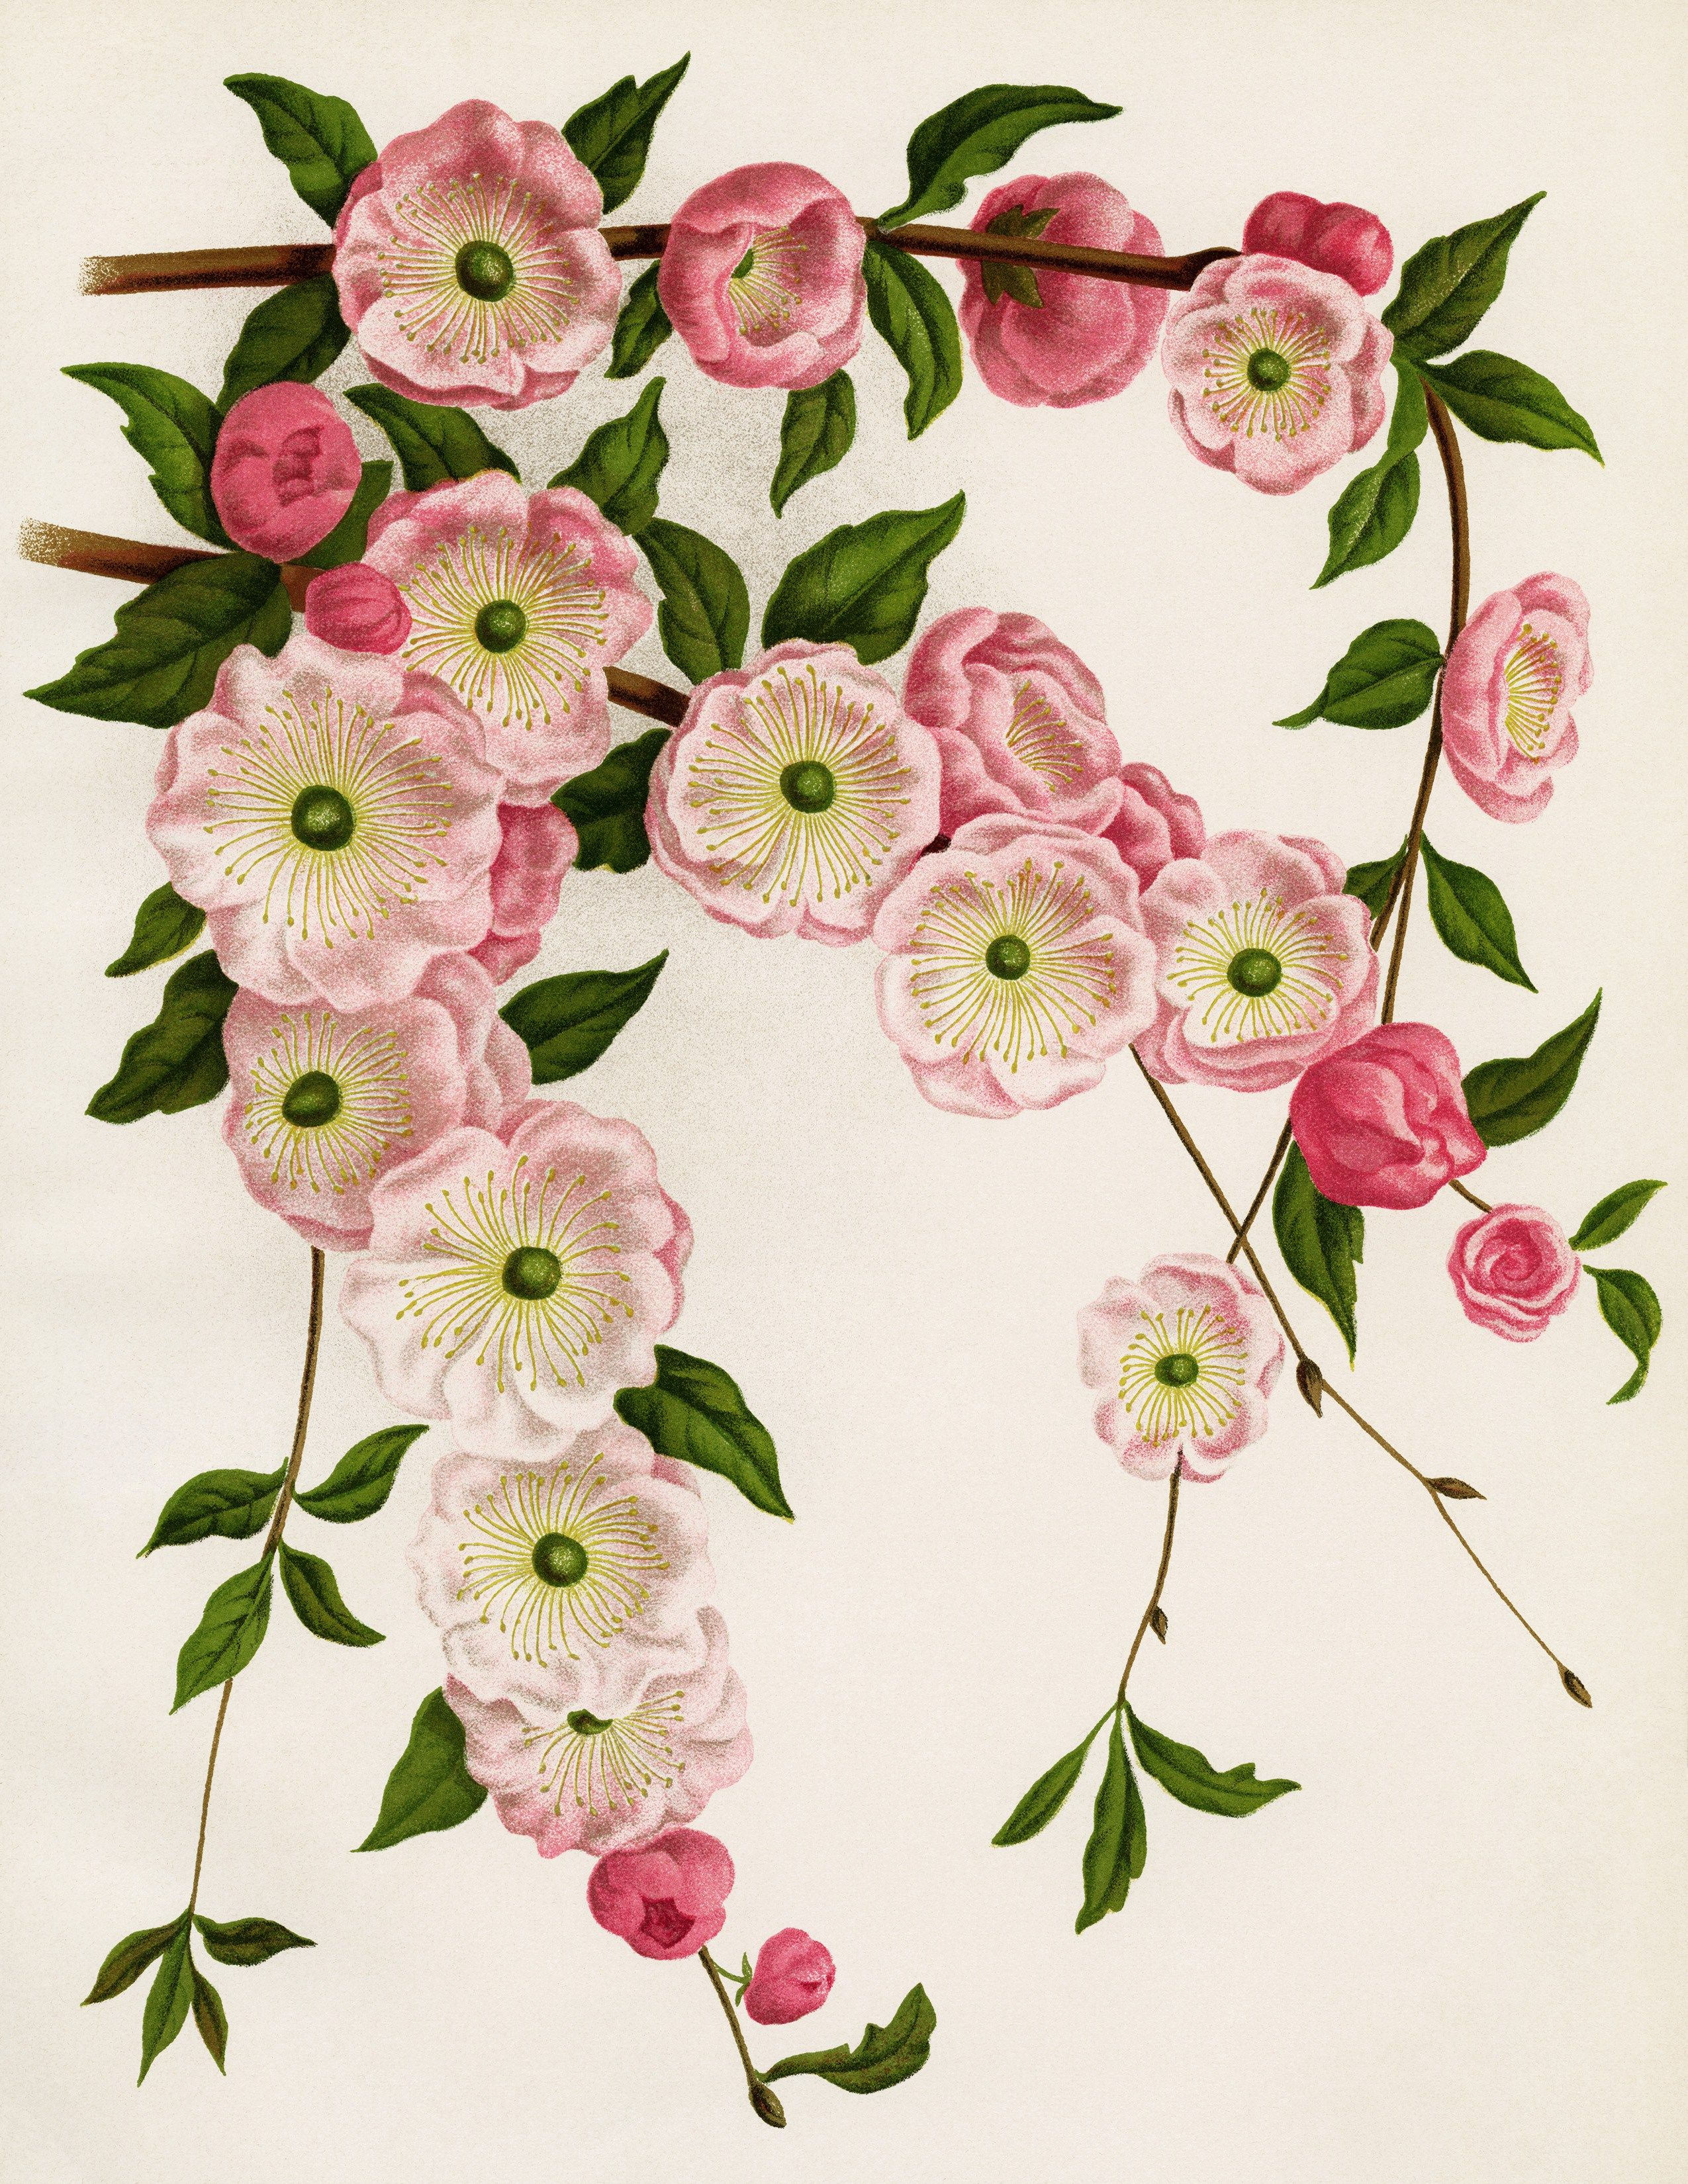 Flor de amendoeira/Almond